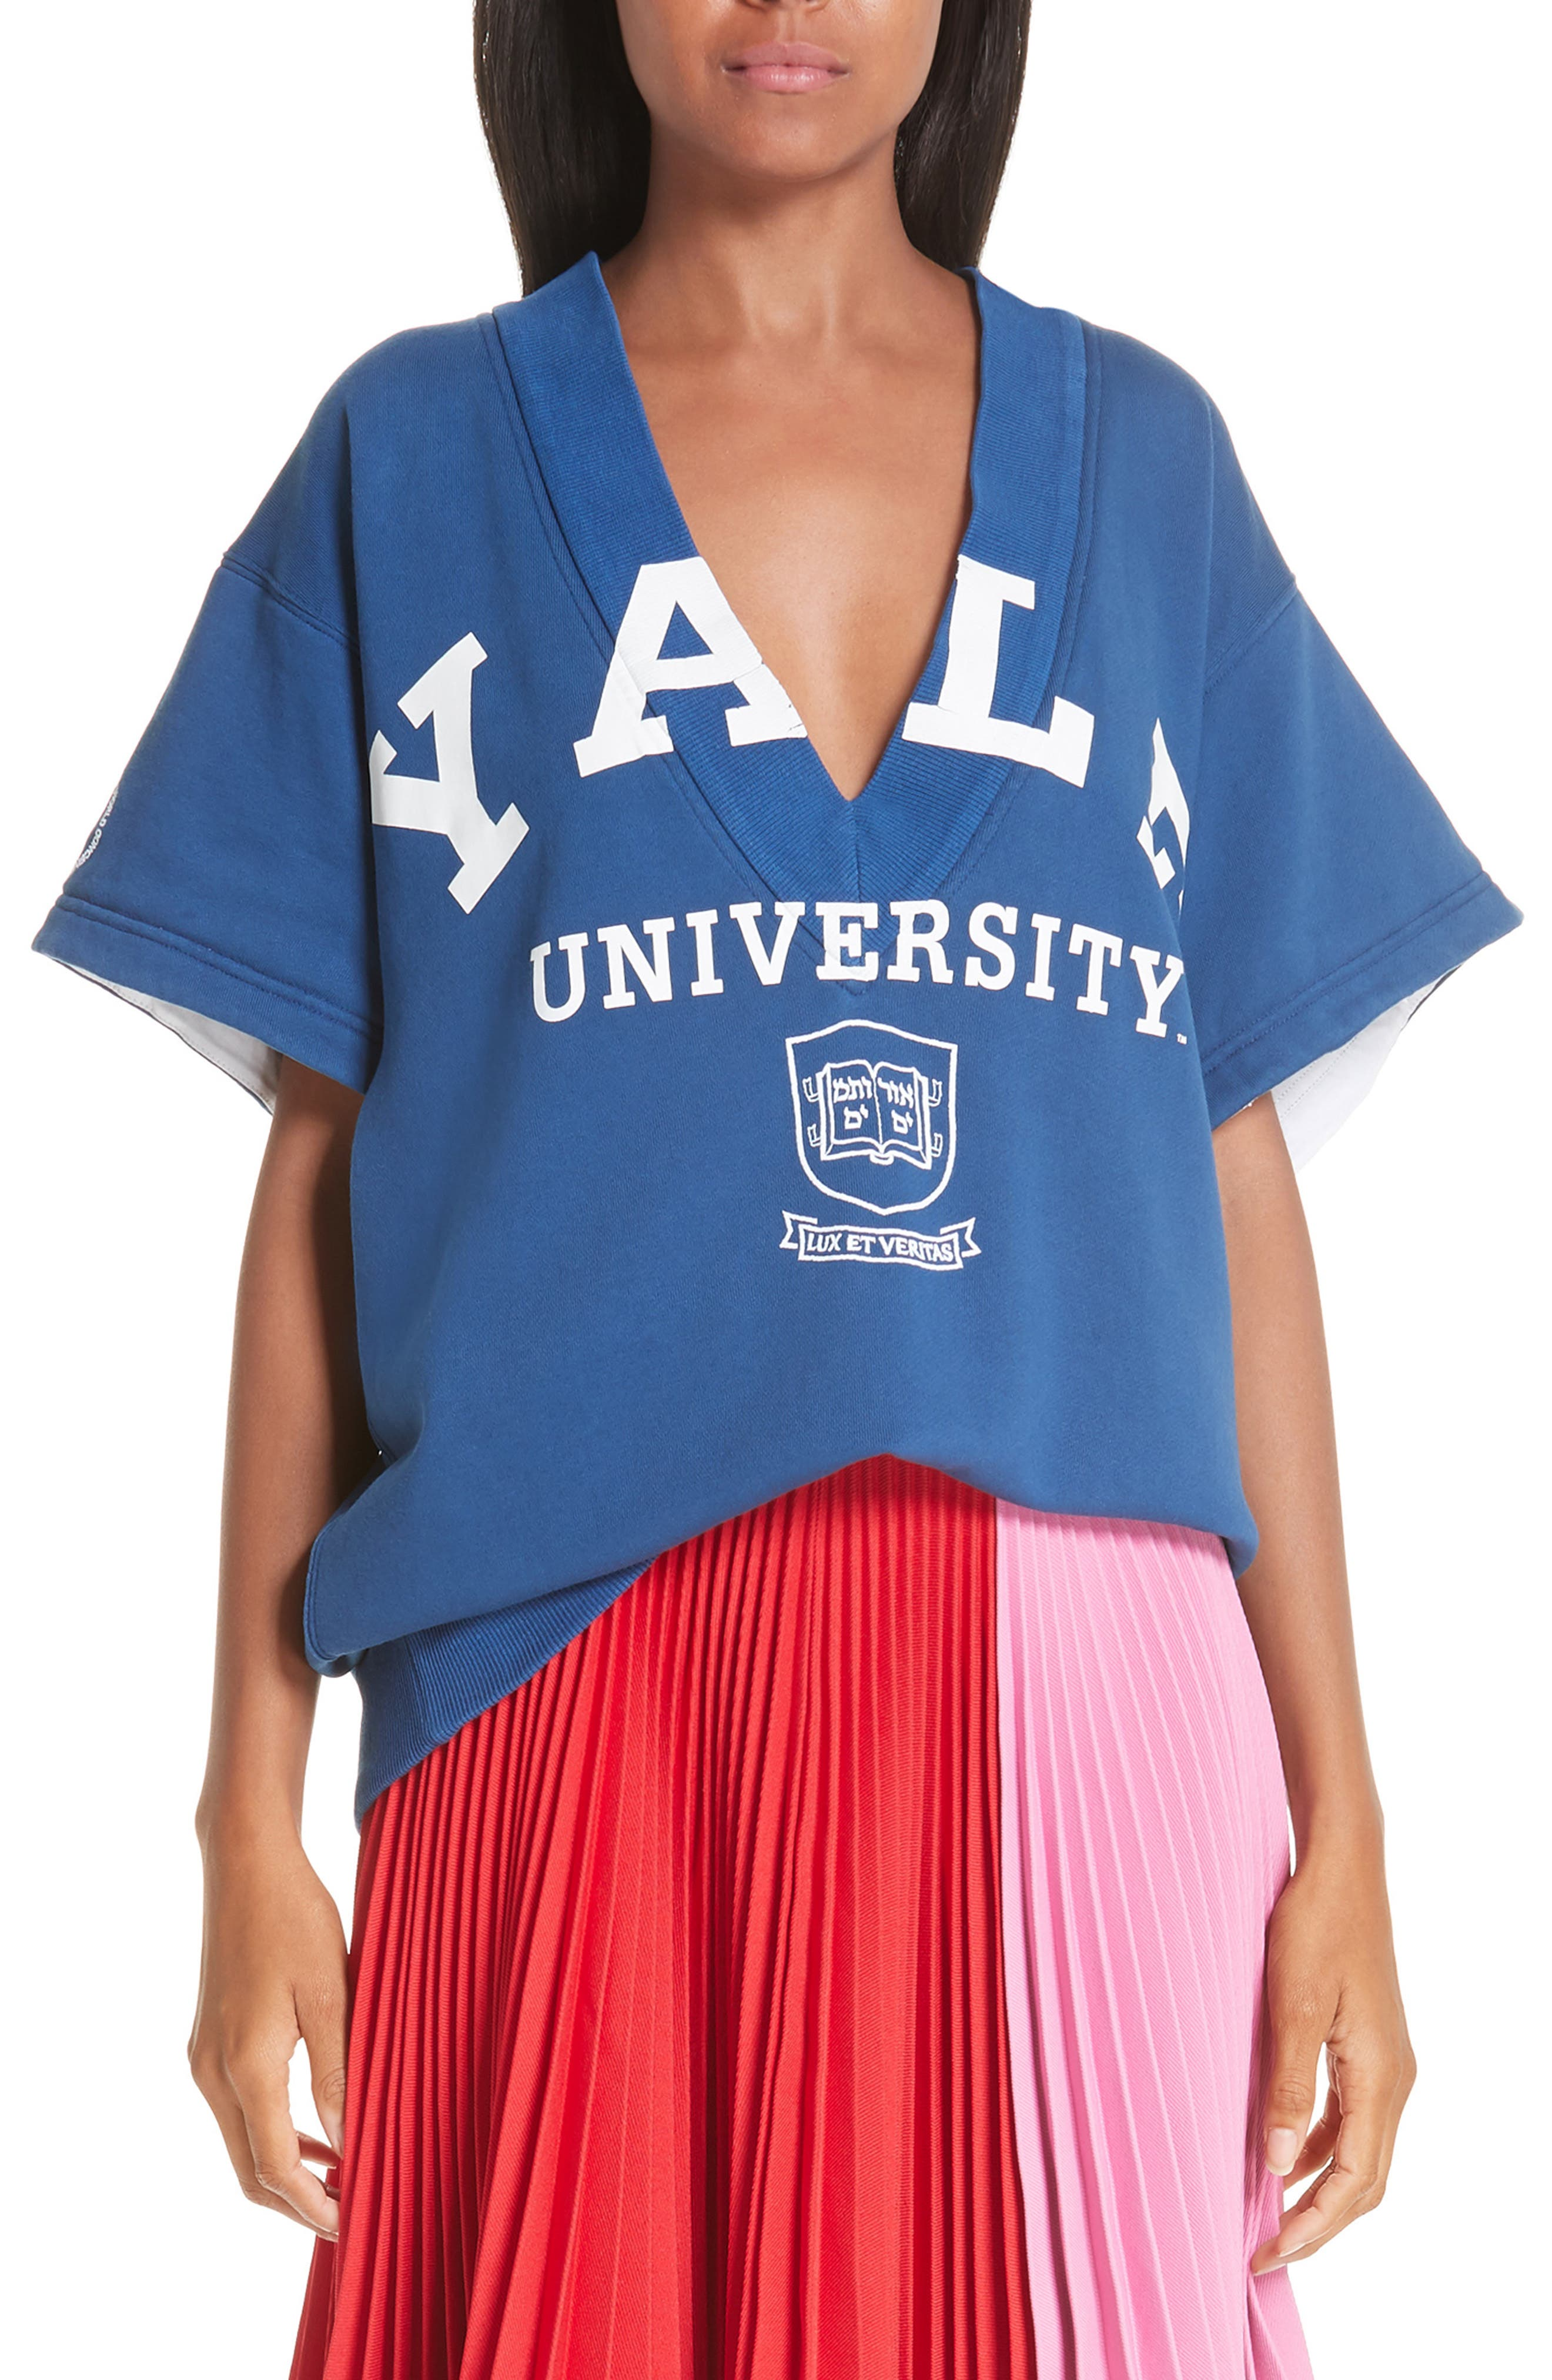 CALVIN KLEIN 205W39NYC Yale Short Sleeve Sweatshirt, Main, color, YALE BLUE